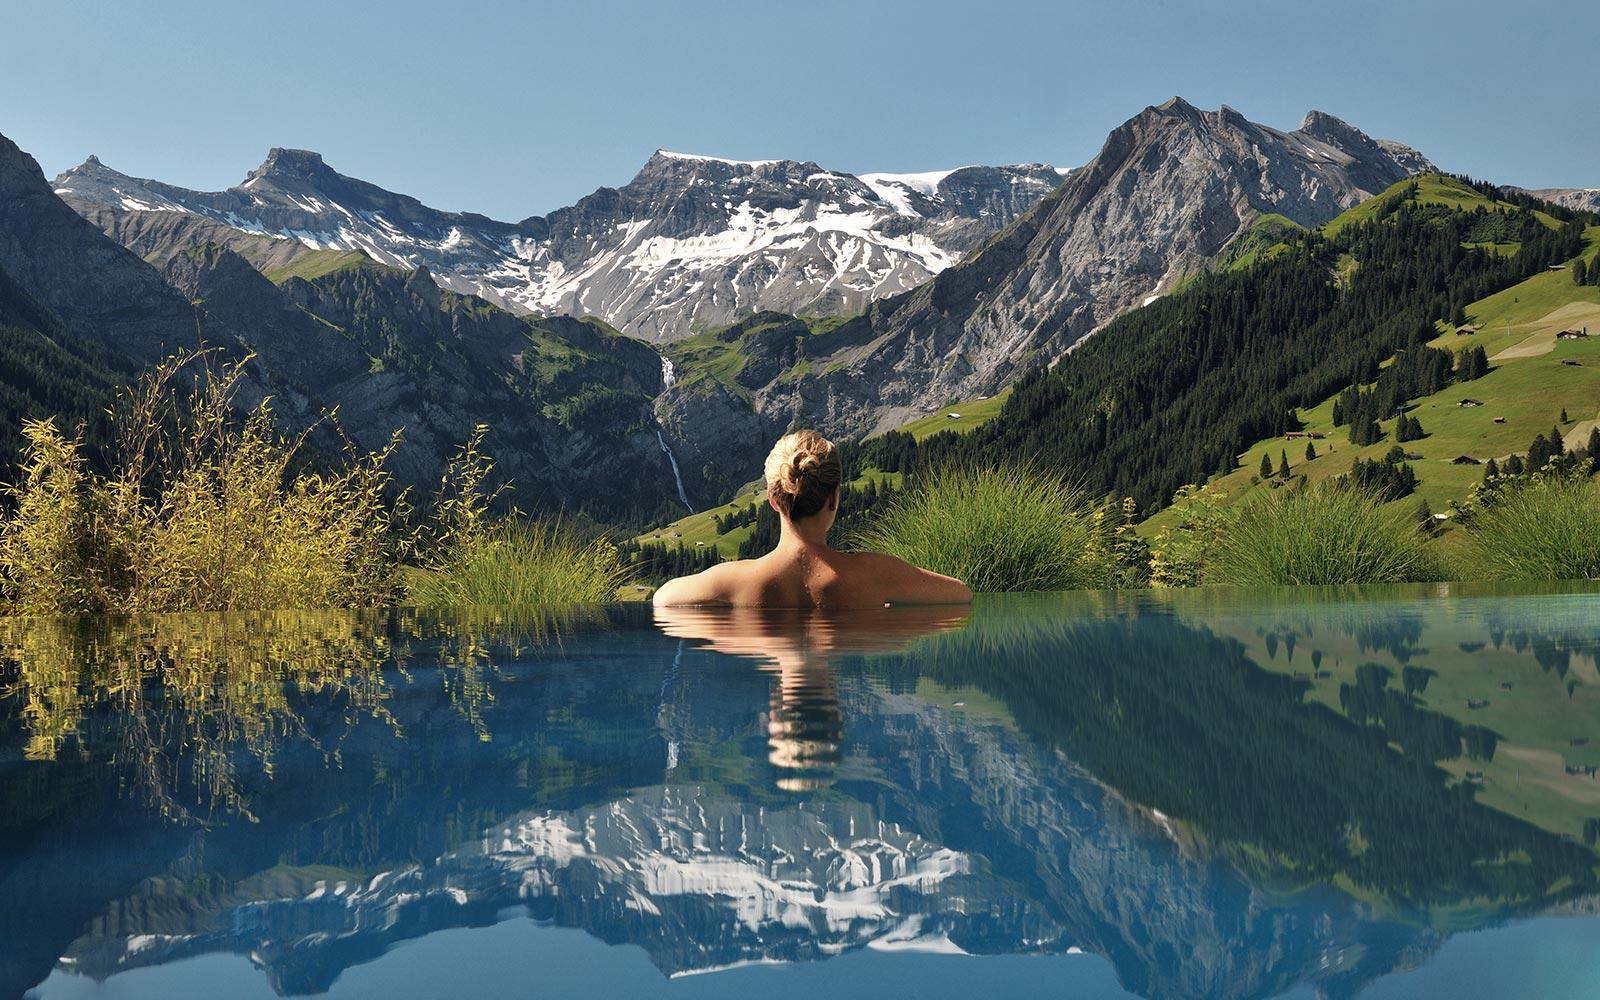 wellness_001_wellnesshotel-spa-schweiz-thecambrian_006